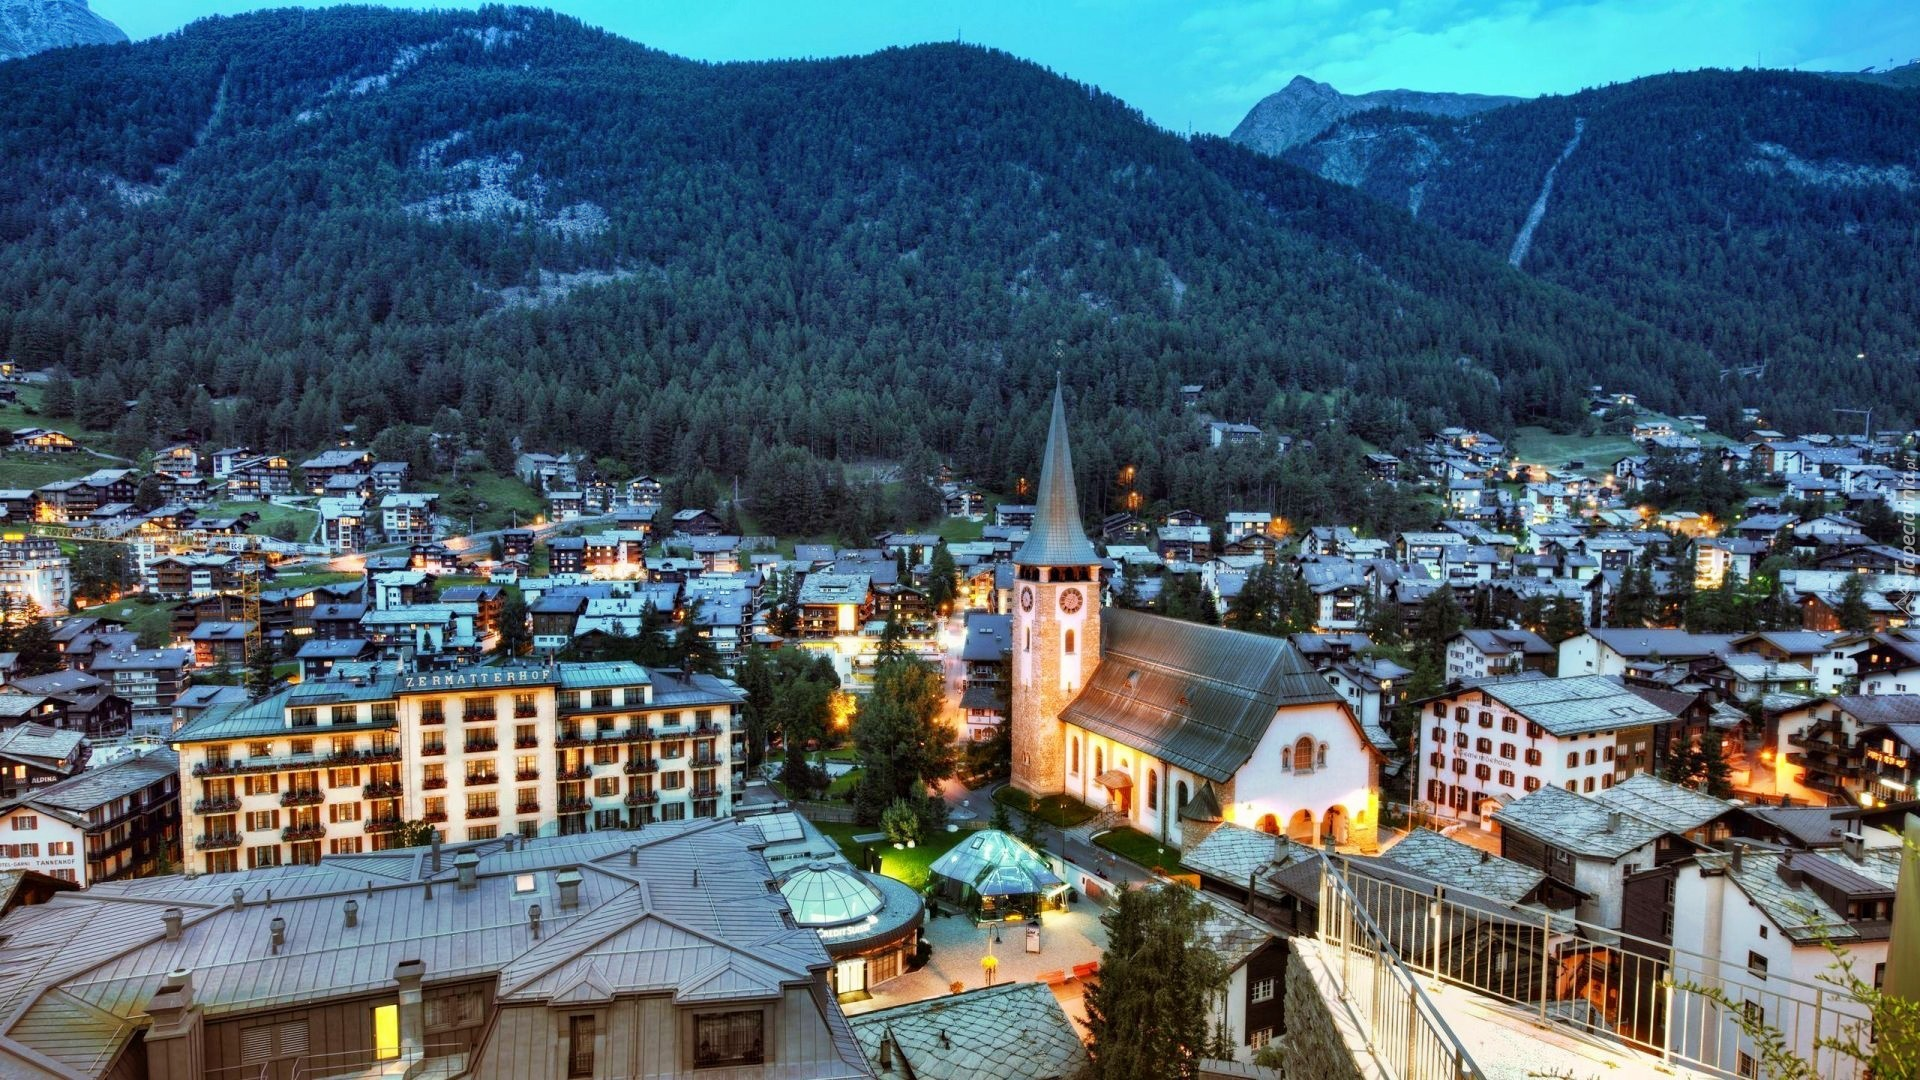 zermatt szwajcaria panorama miasta